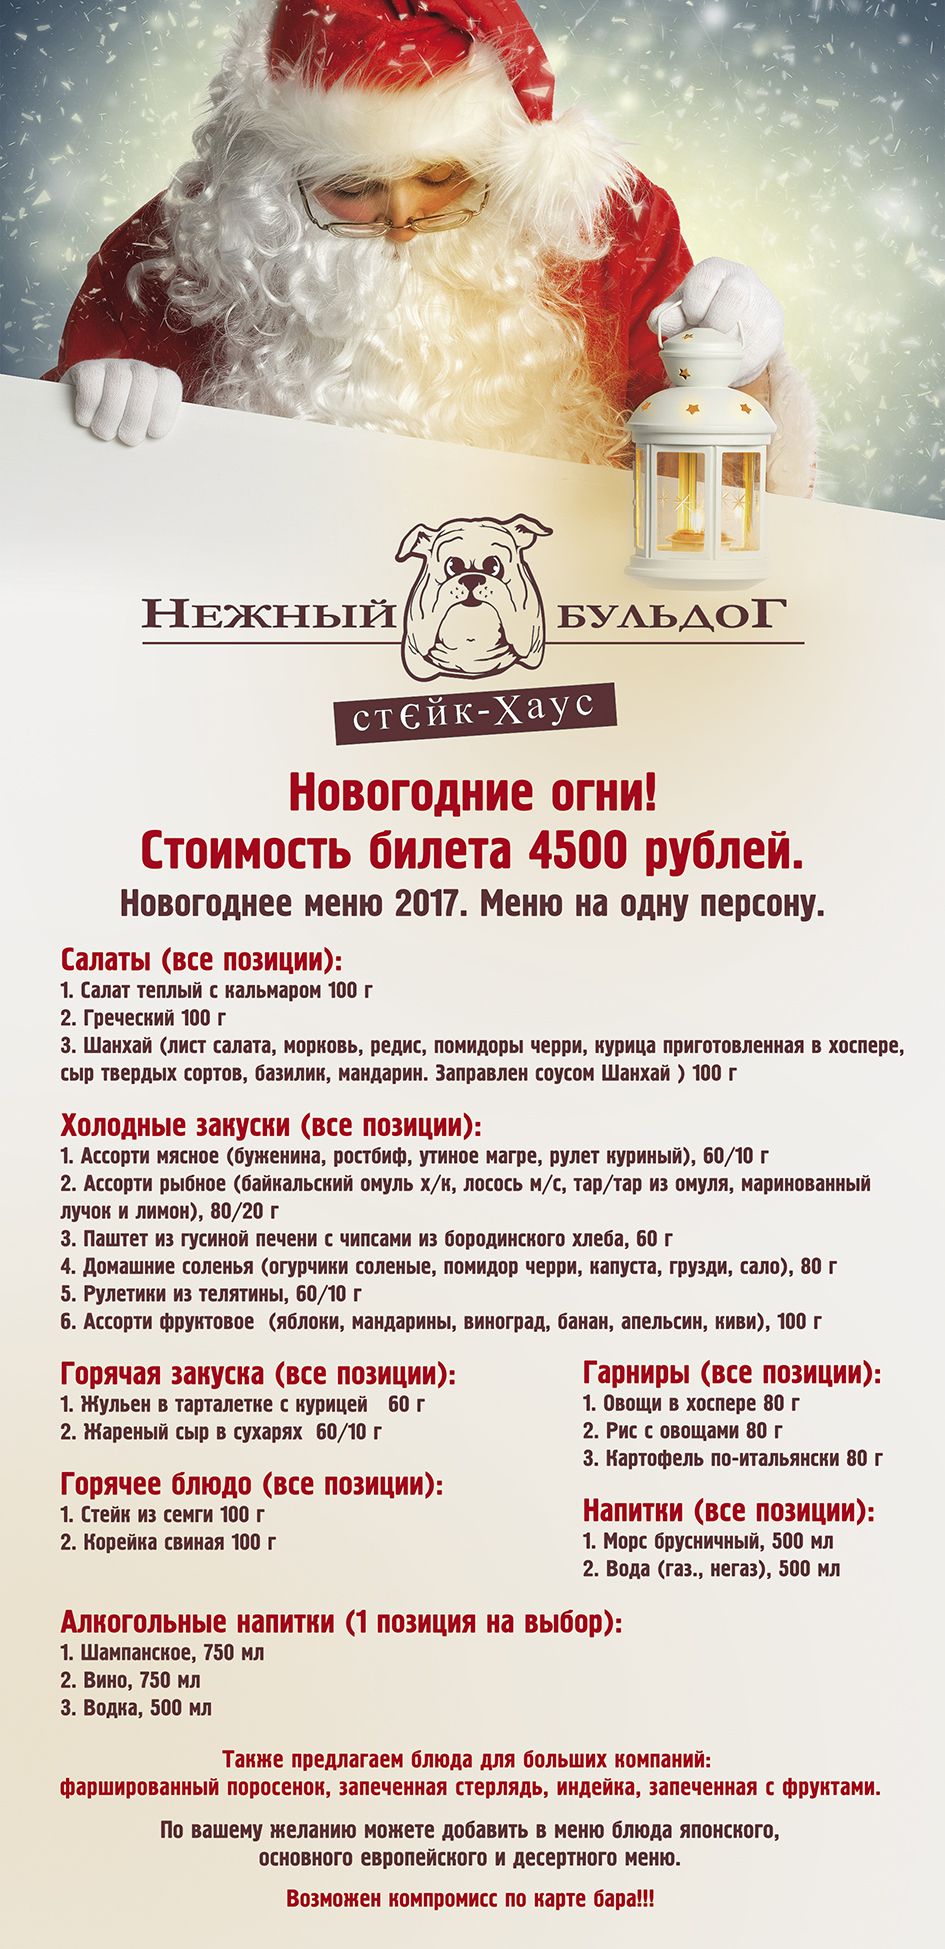 НБ_Нов. меню_4500 руб.jpg